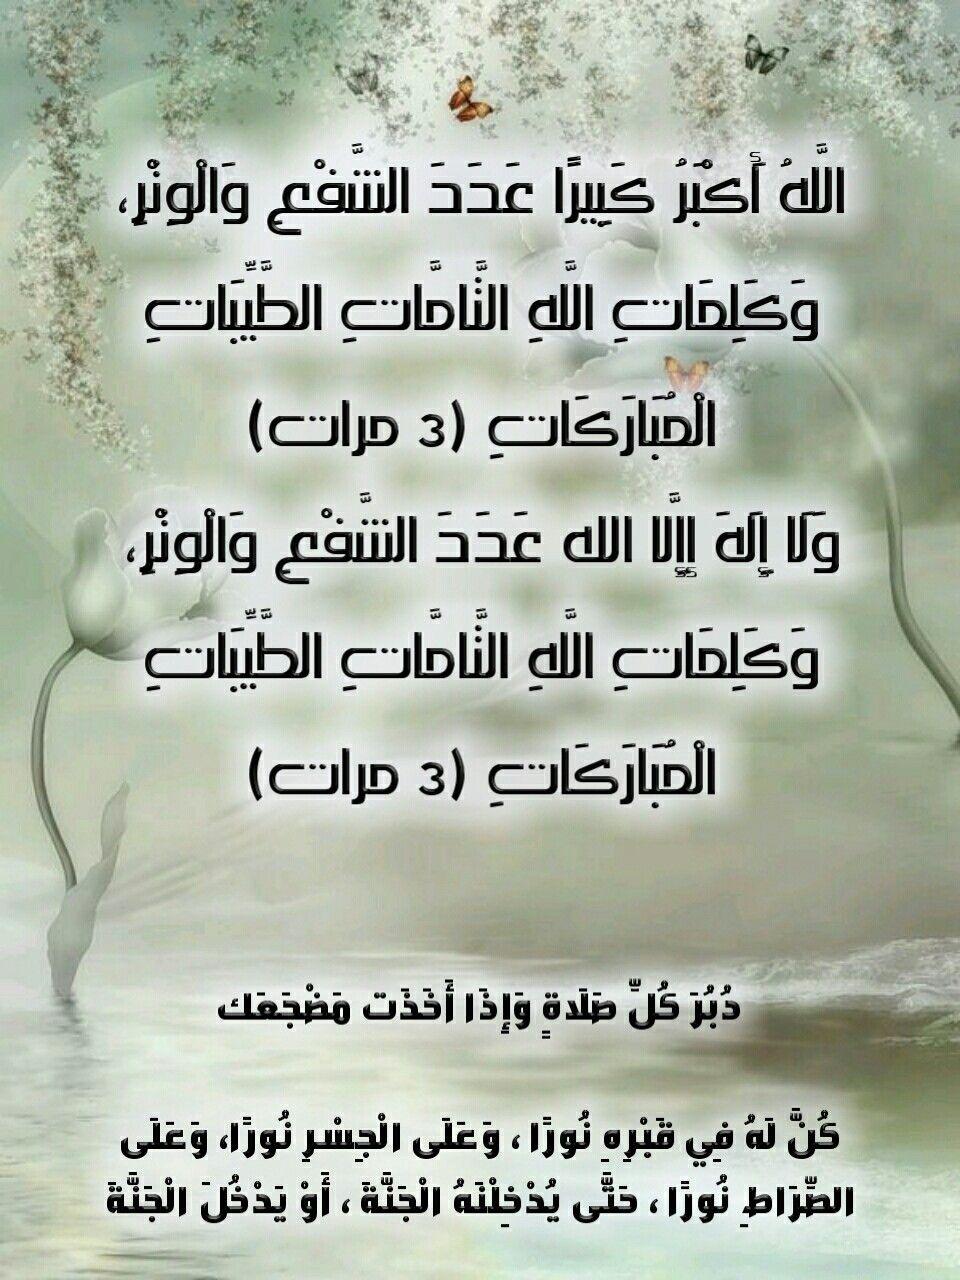 الله اكبر كبيرا دعاء ذكر حديث Islamic Pictures Person Personalized Items